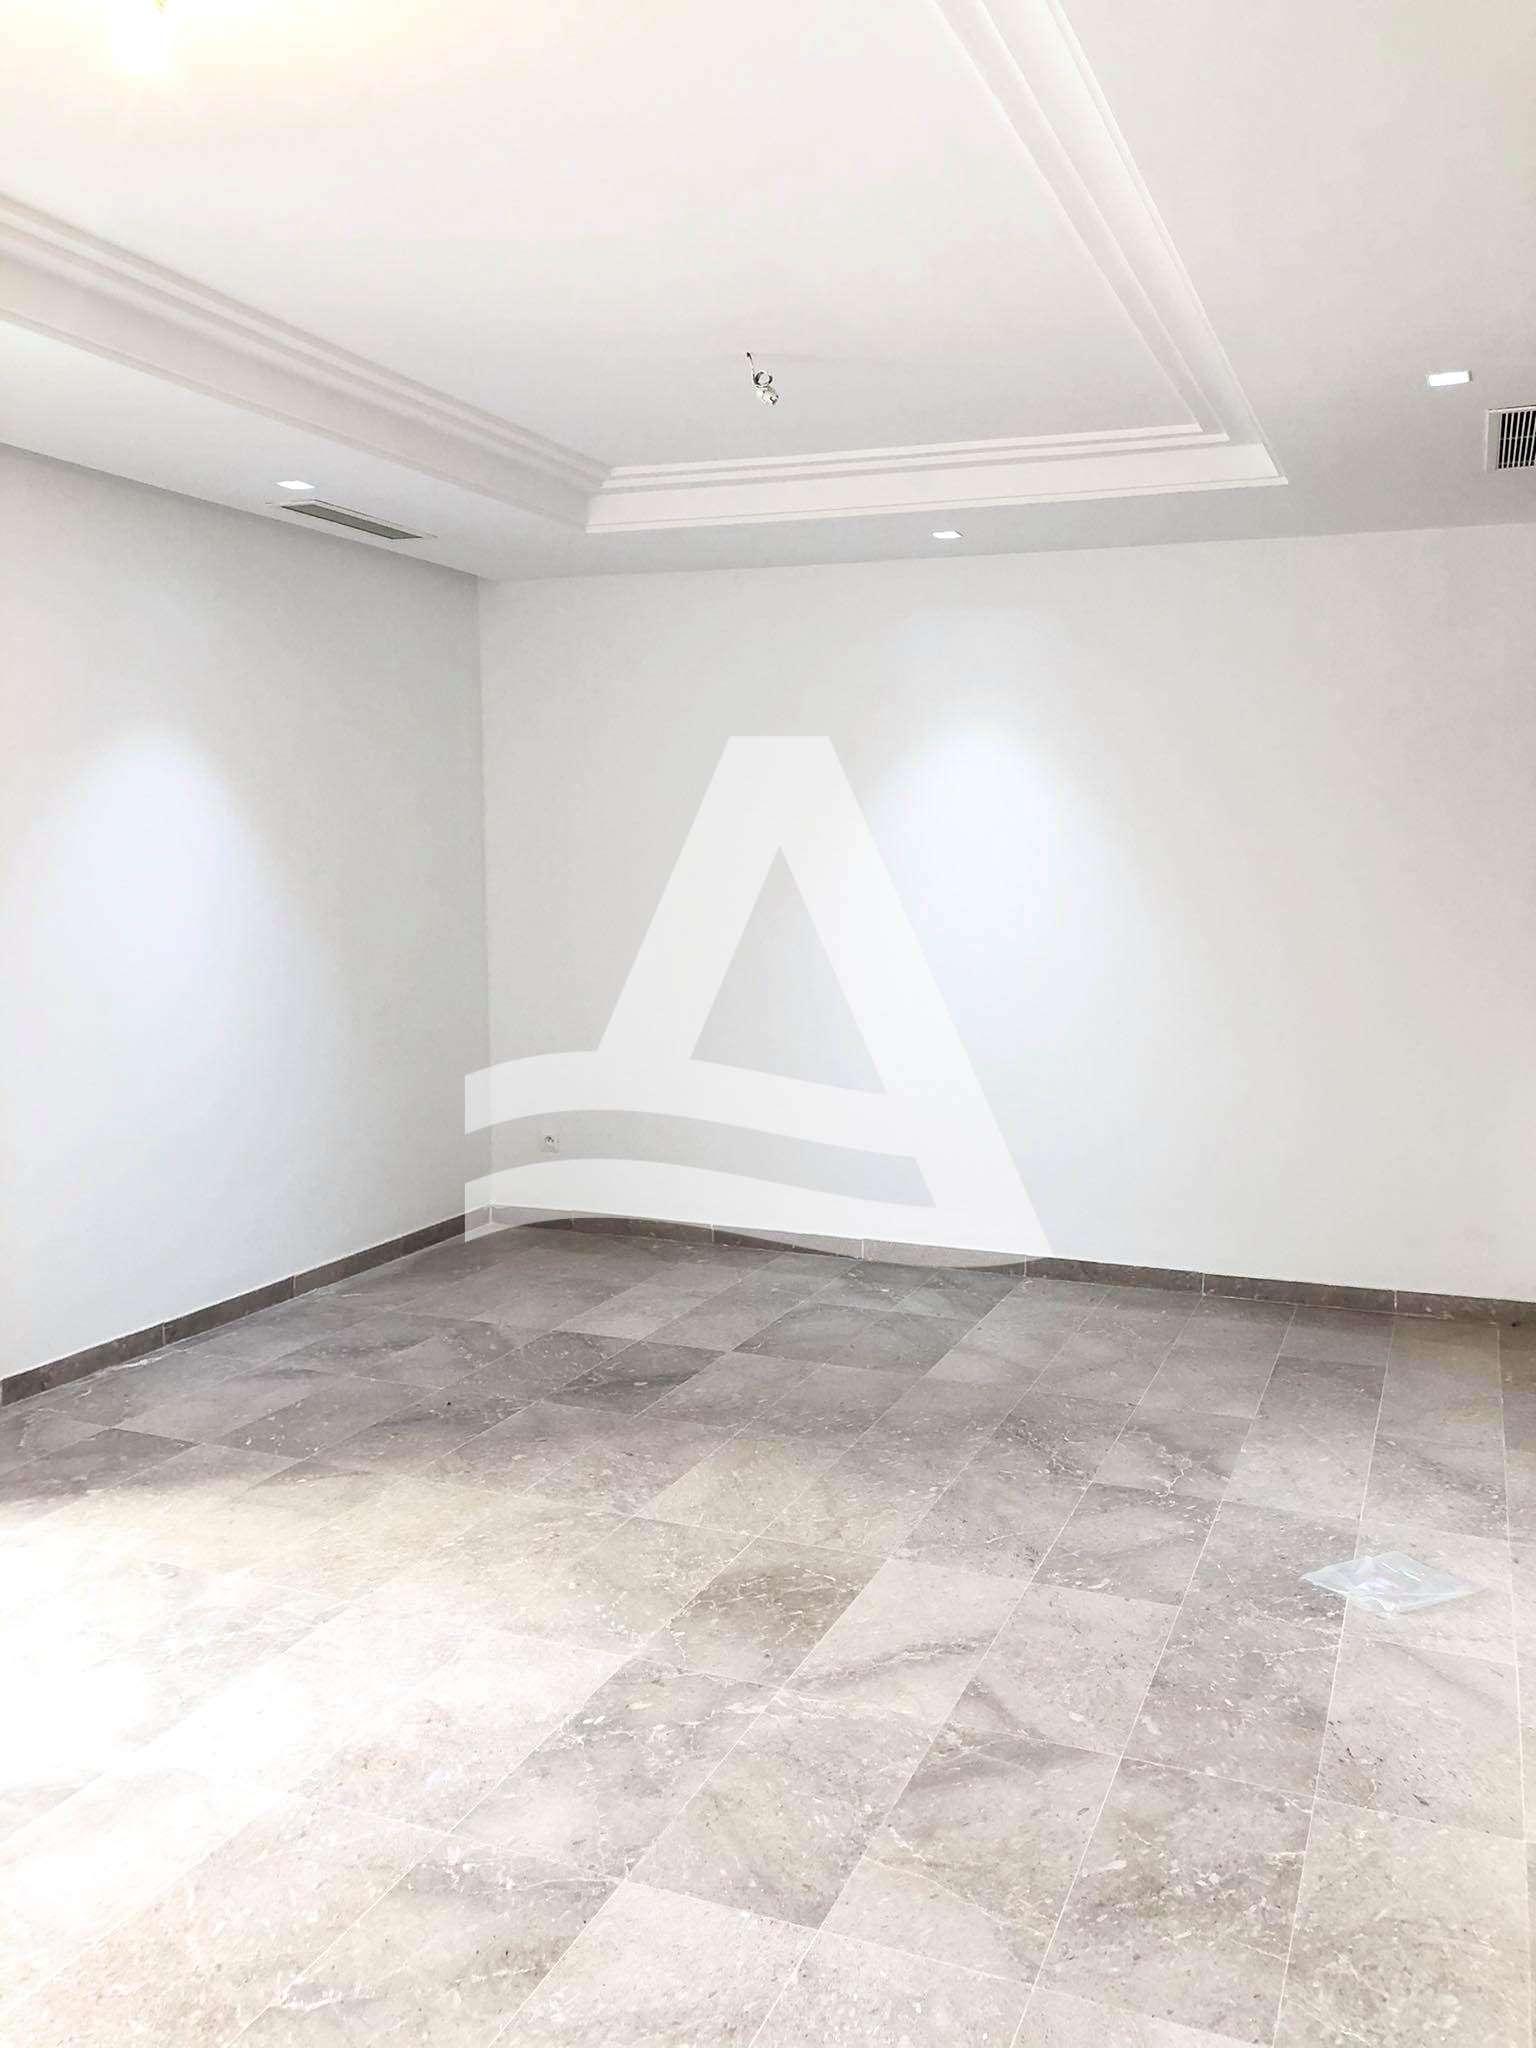 httpss3.amazonaws.comlogimoaws438734531613127205appartement_jardin_de_carthage_9_sur_14